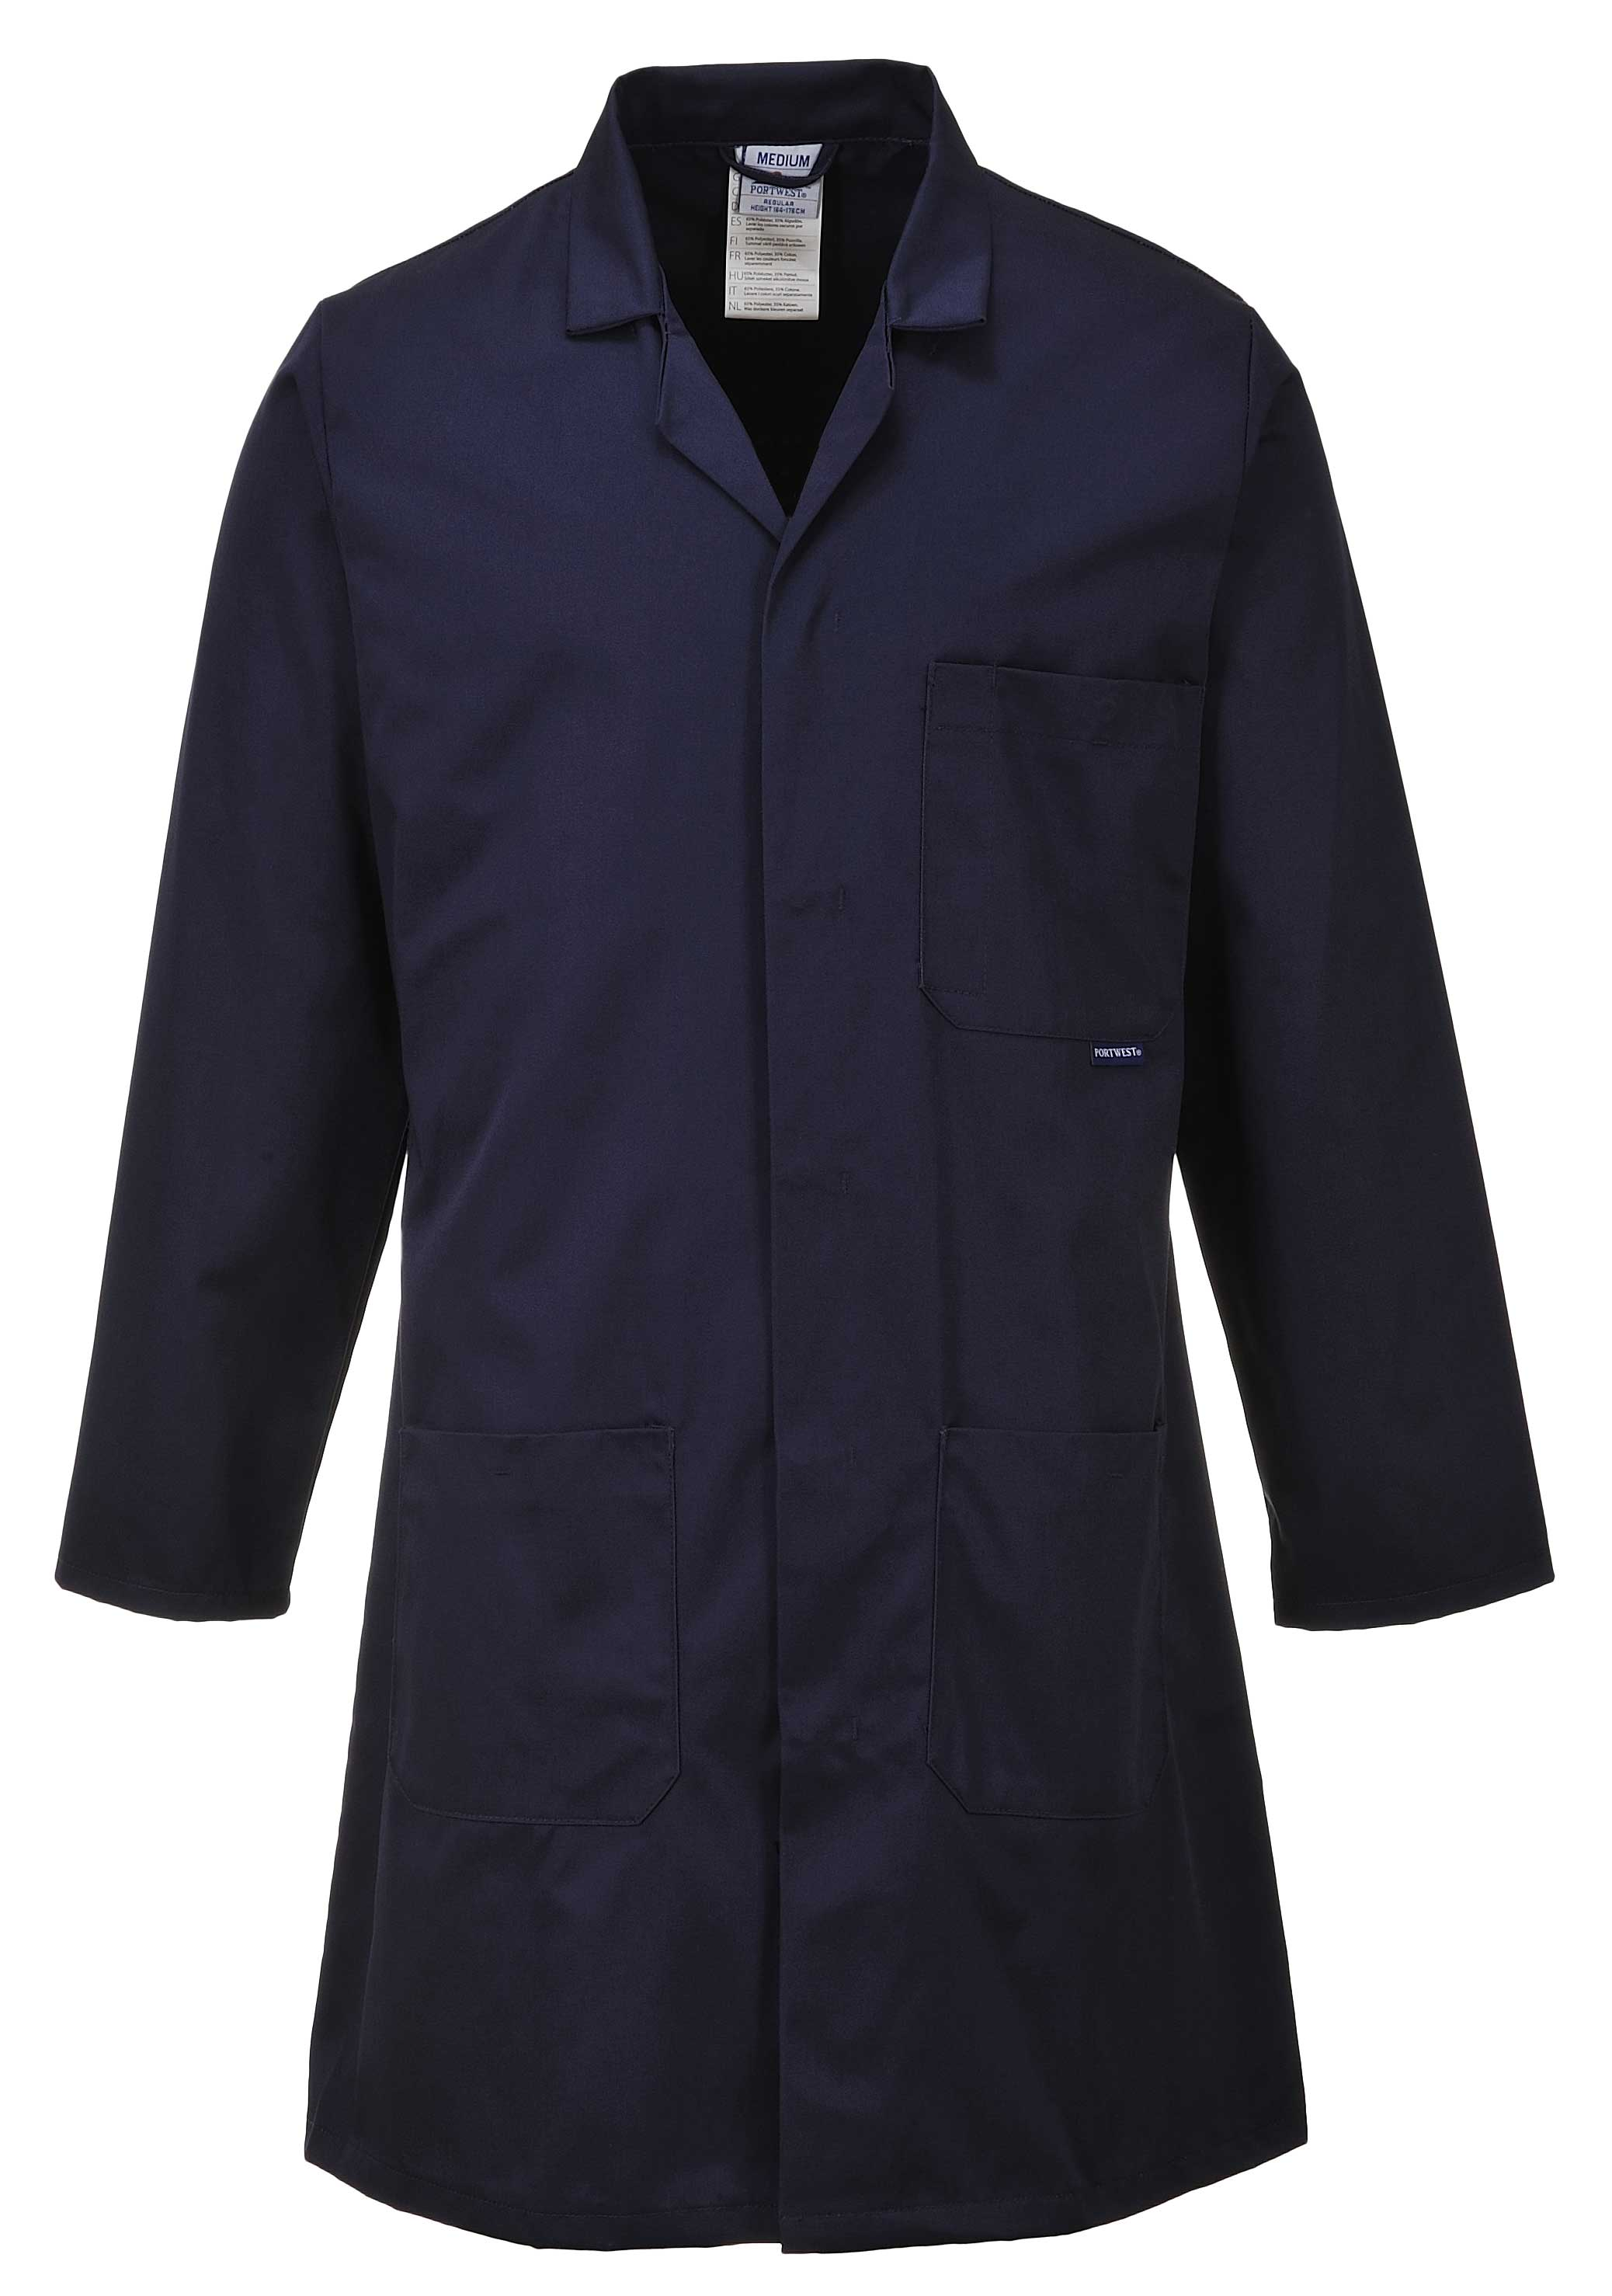 northrock safety laboratory coat laboratory coat. Black Bedroom Furniture Sets. Home Design Ideas